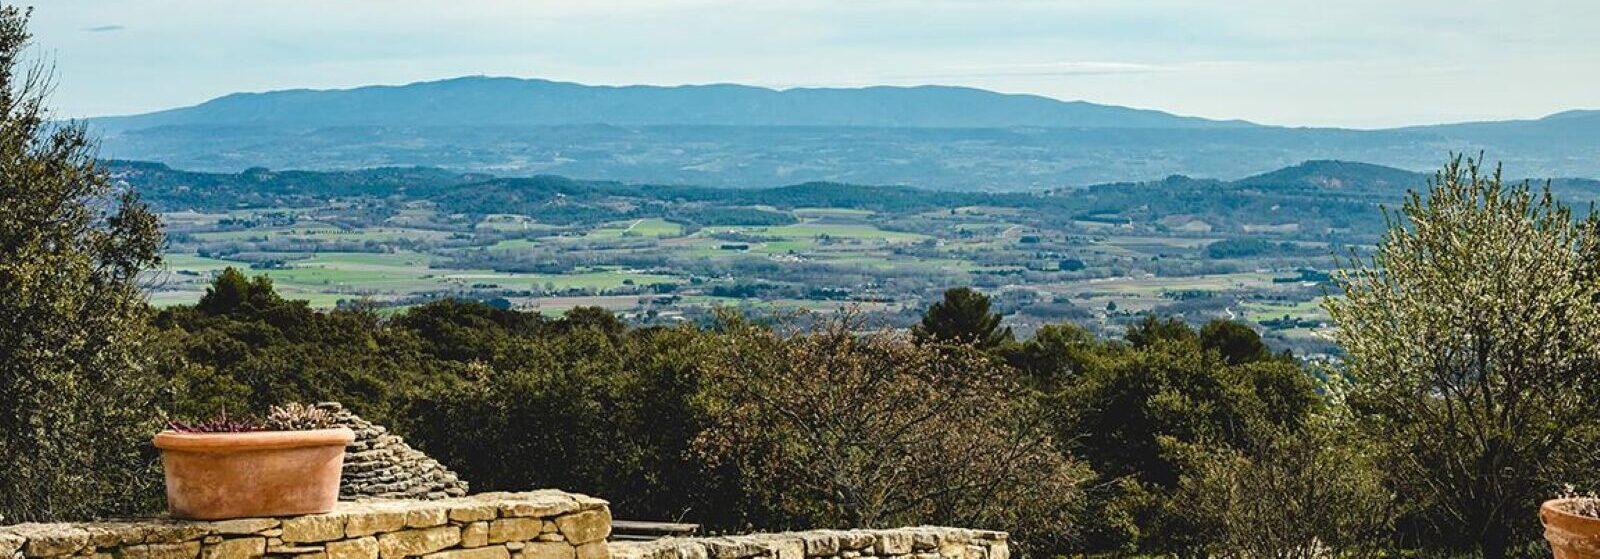 Supertrips - Romantisch hotel in Zuid-Frankrijk